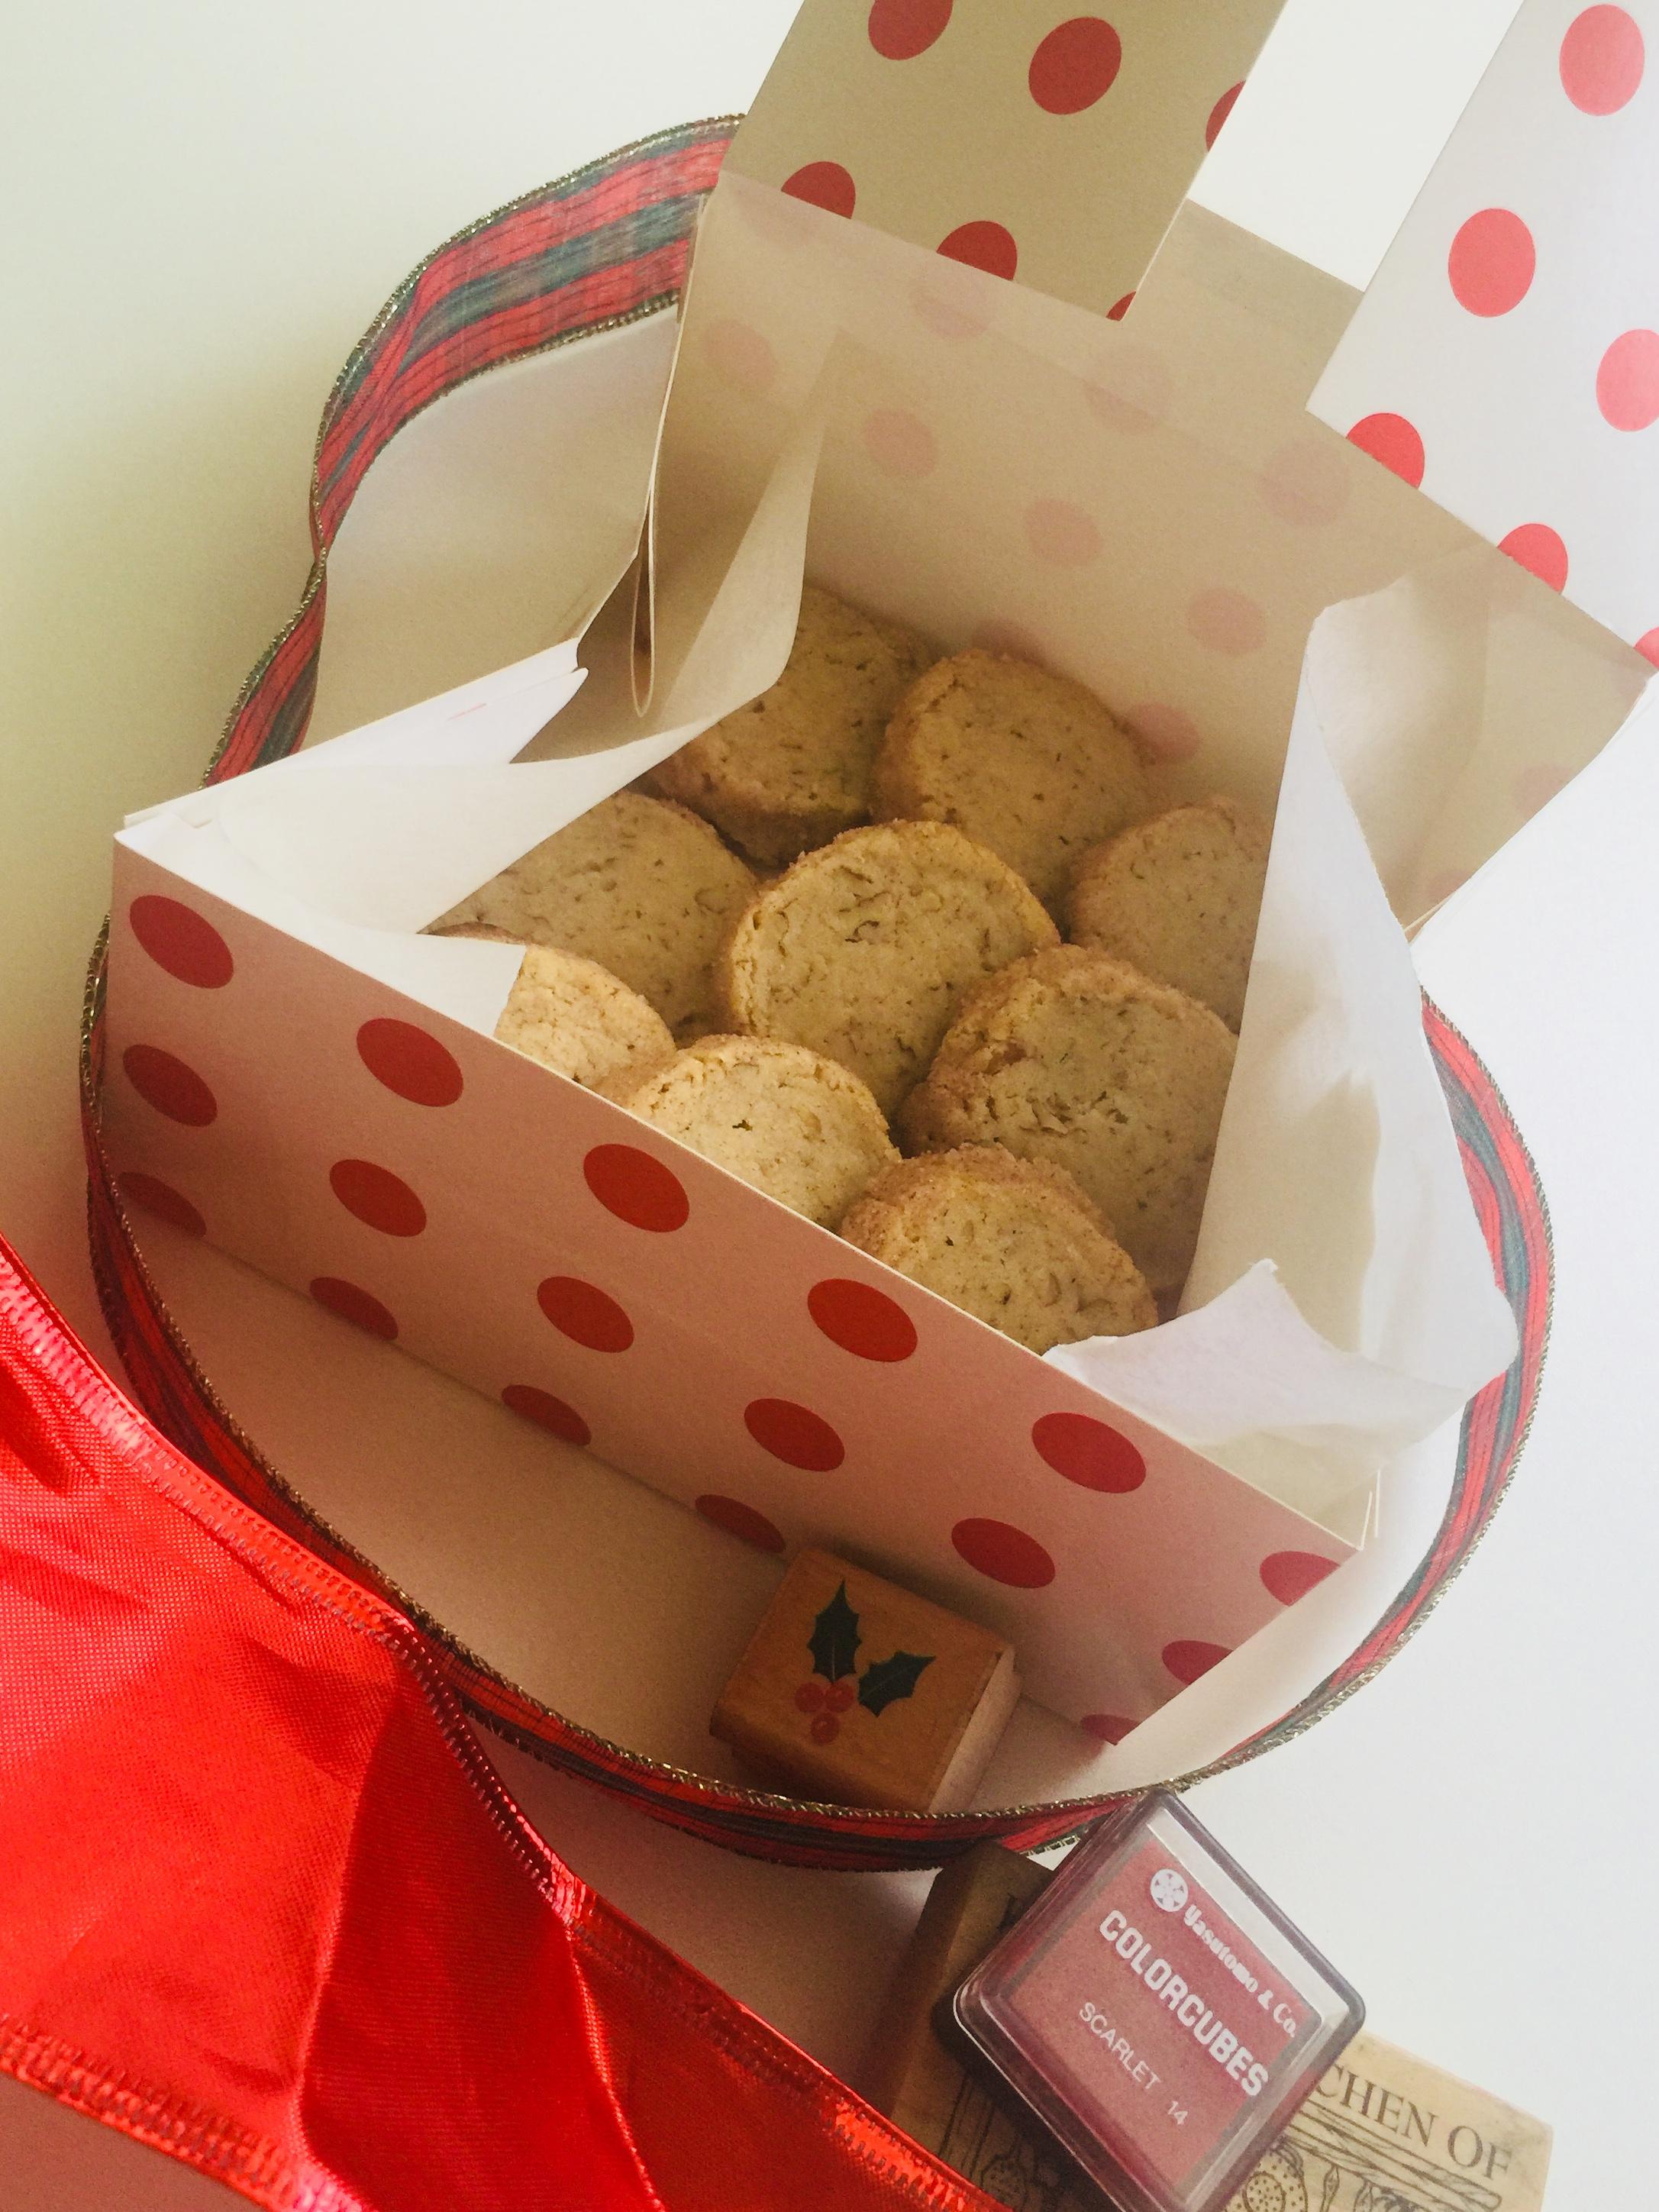 Cinnamon Pecan Icebox Cookies - Ready for gifting